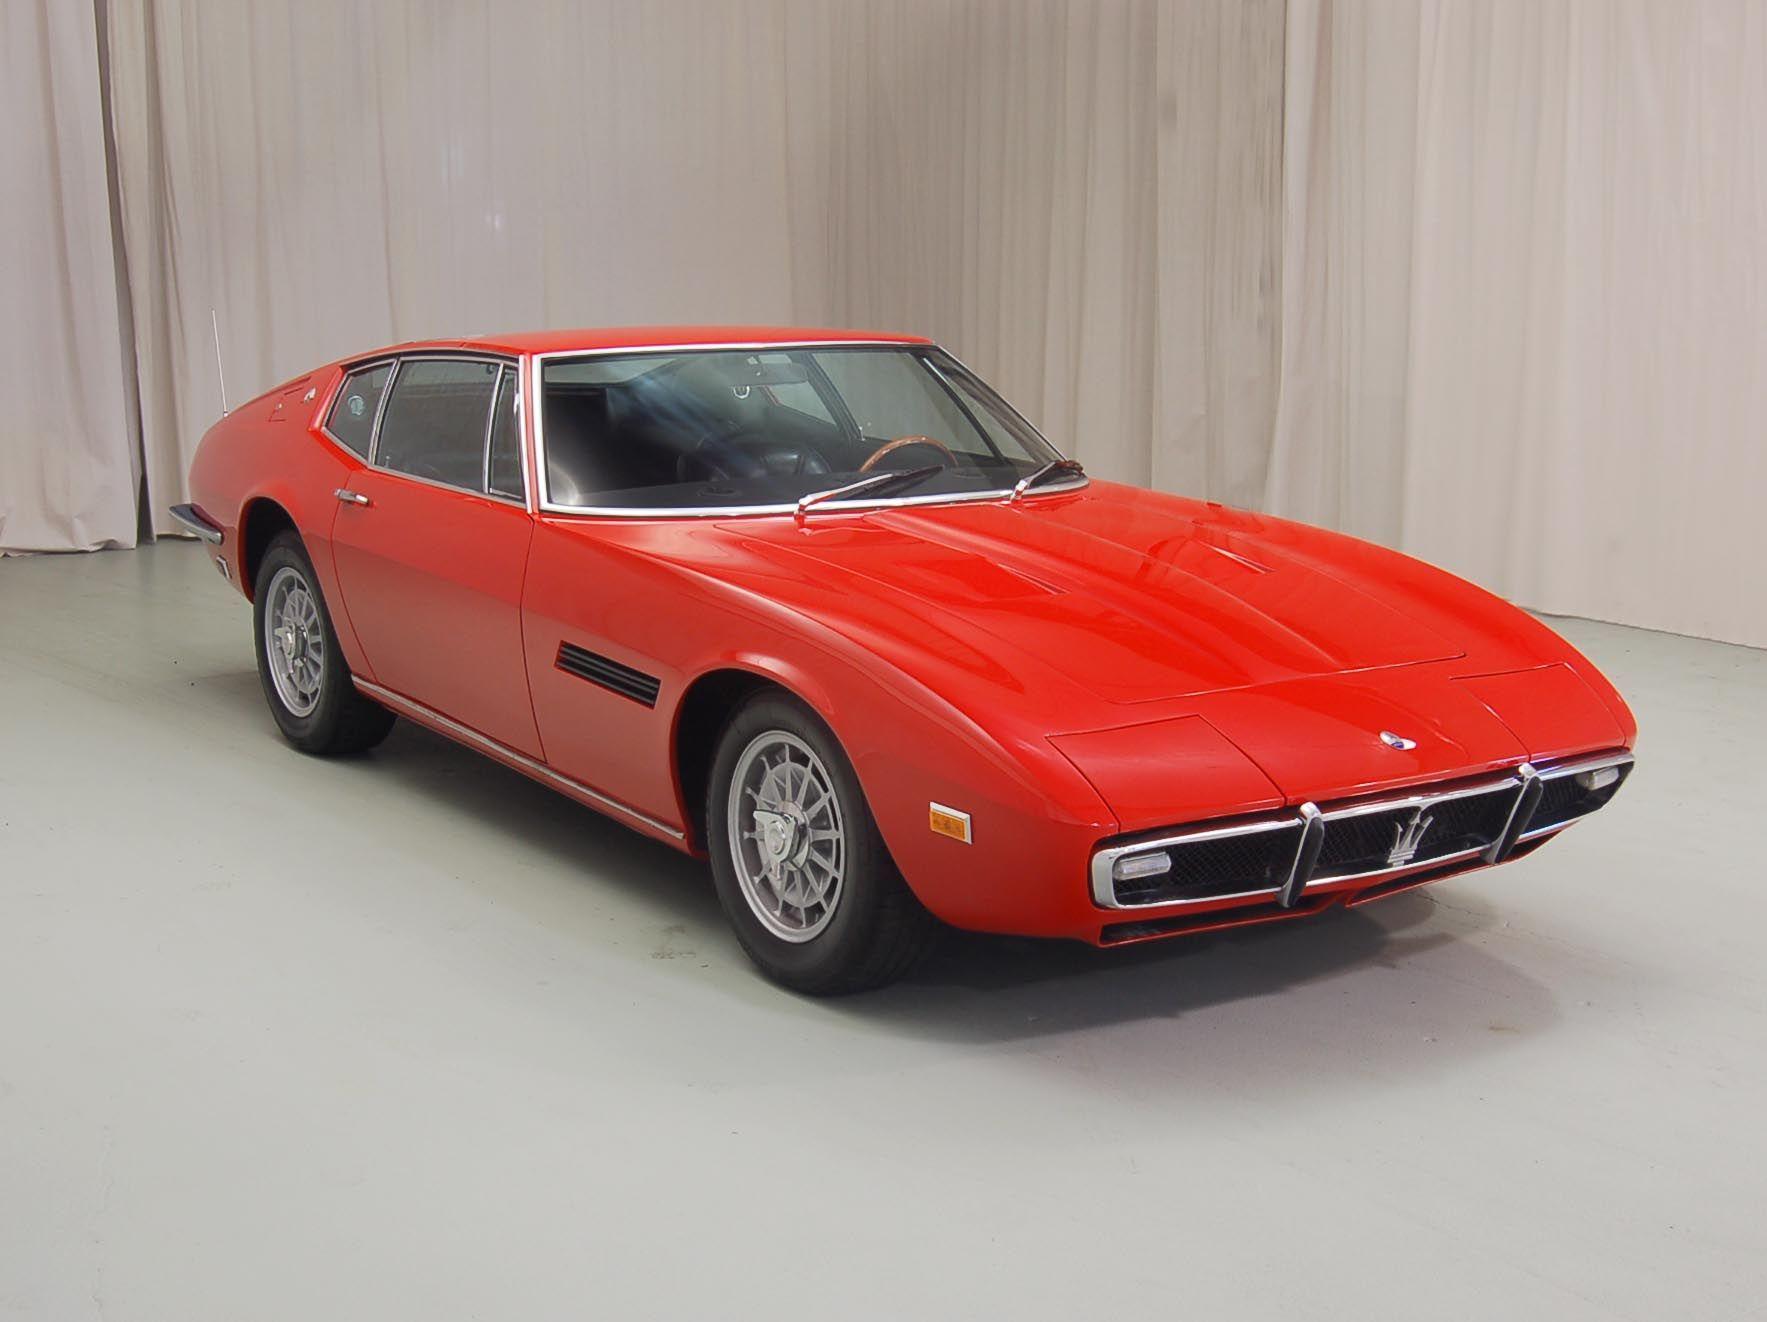 1964 Maserati Mistral Coupe For Sale Rear | Maserati | Pinterest ...